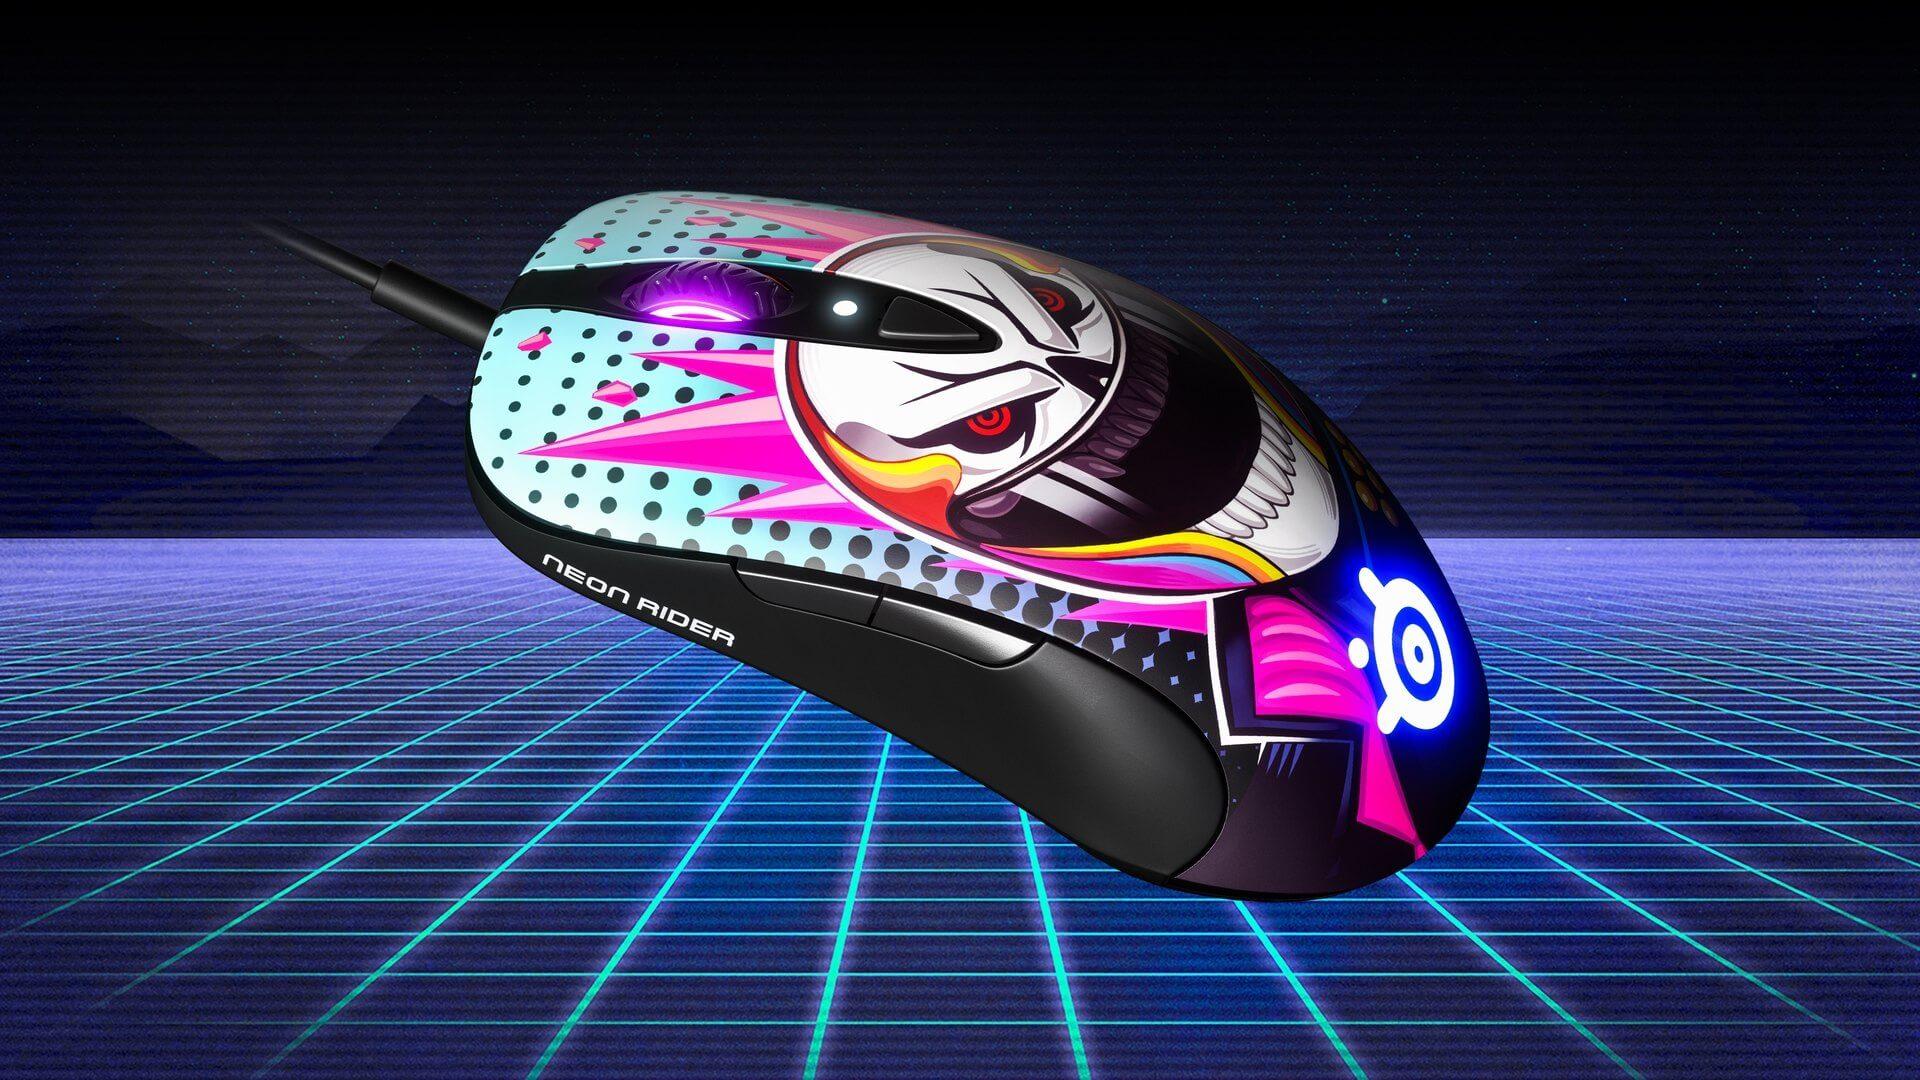 Thiết kế hoạ tiết của Chuột Chơi game SteelSeries Sensei Ten Neon Rider Edition (62528) (USB/RGB/NeonRider)